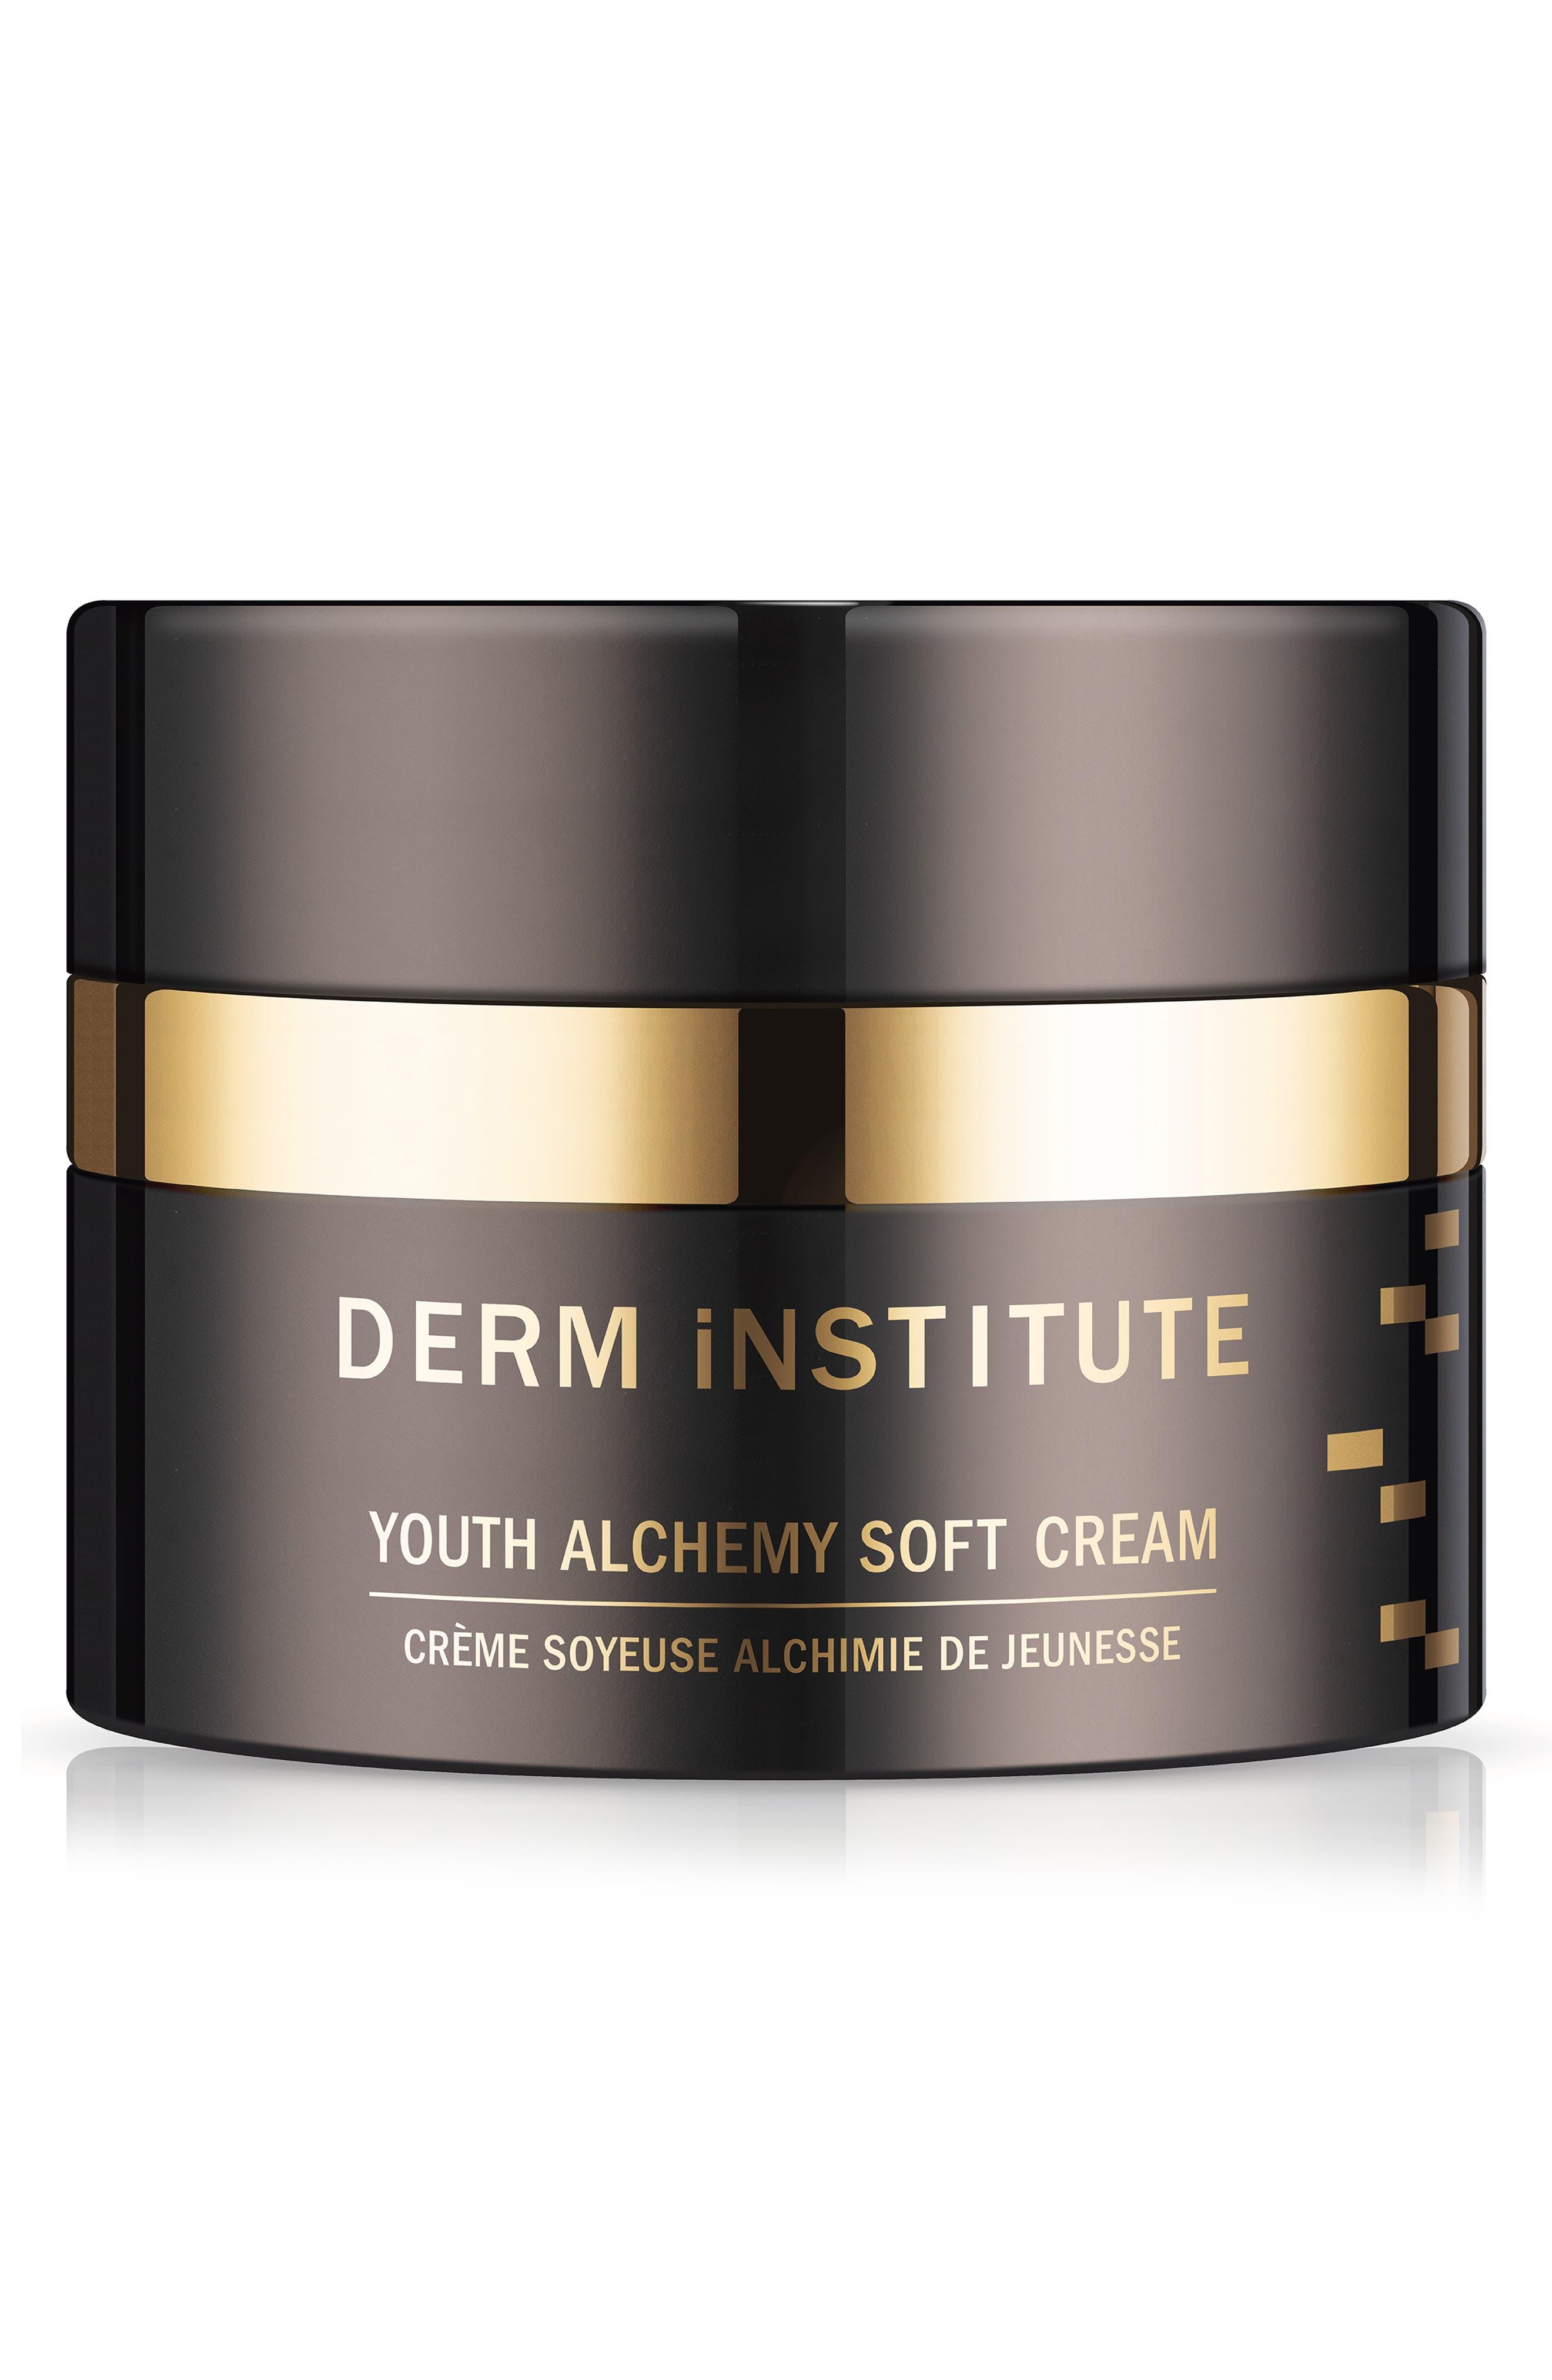 Youth Alchemy Soft Cream